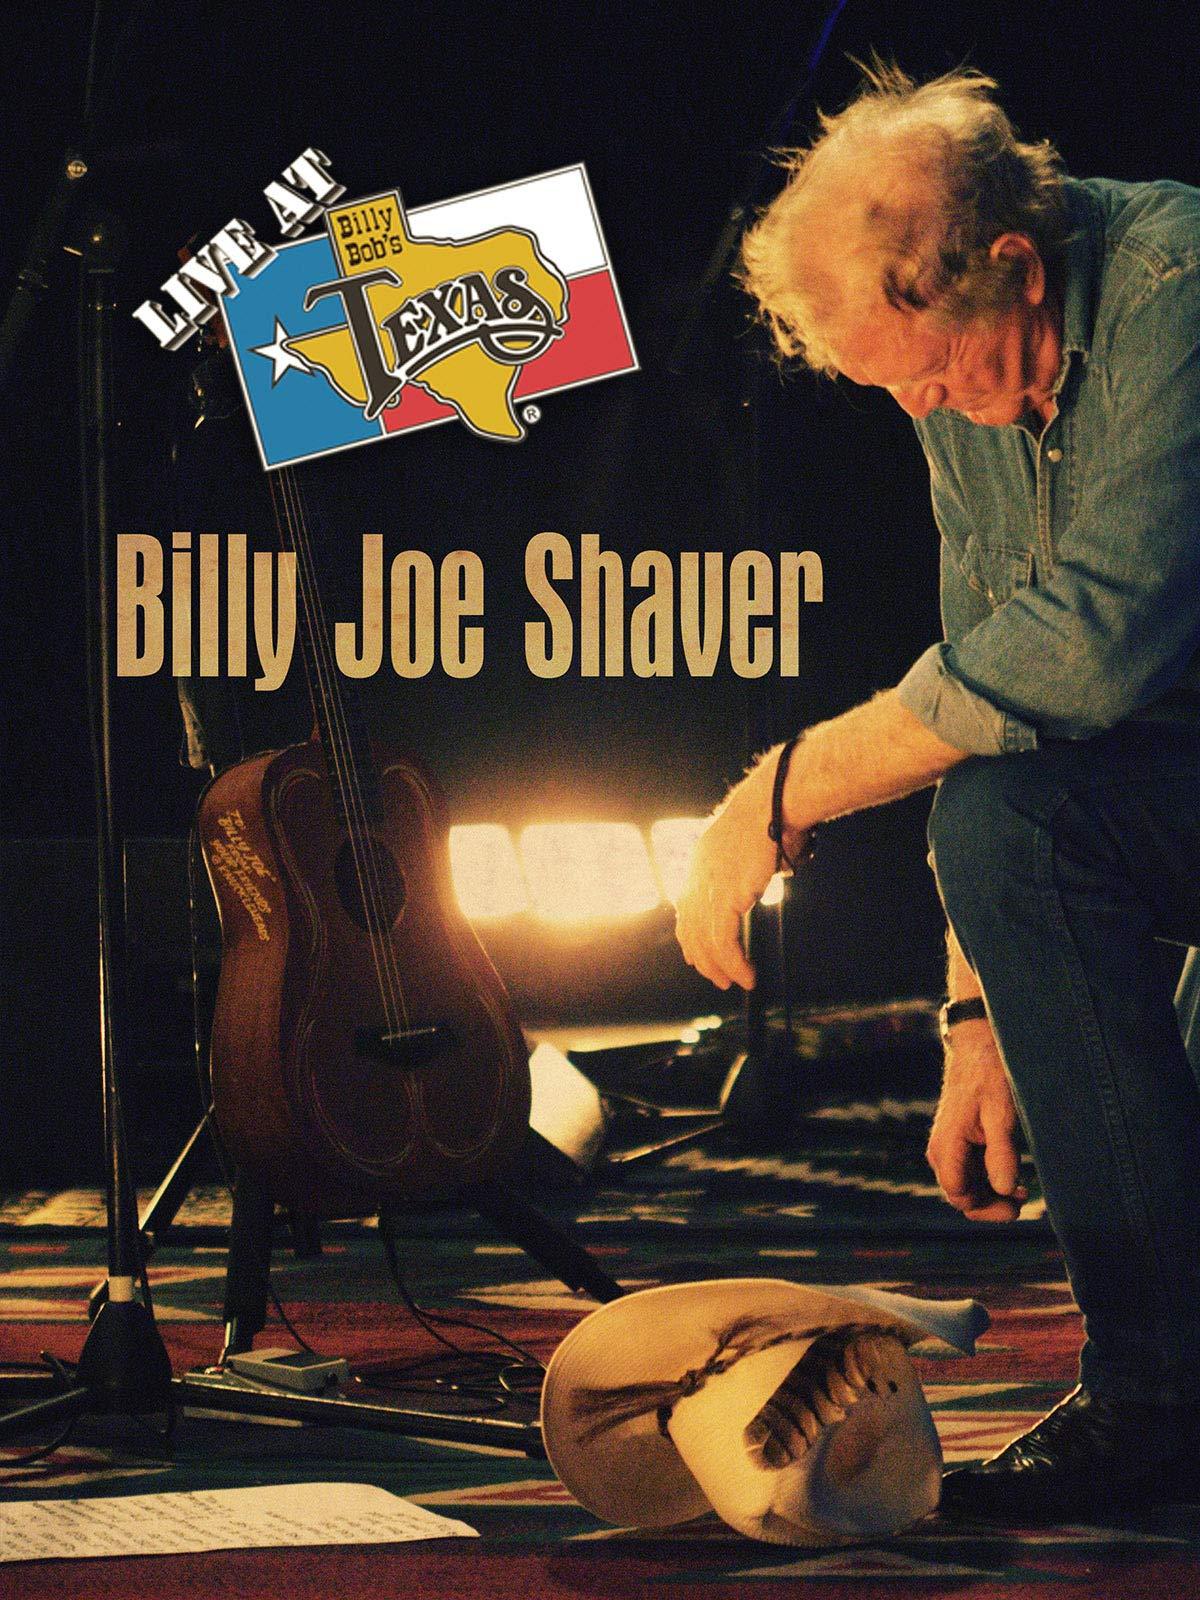 Live at Billy Bob's Texas: Billy Joe Shaver